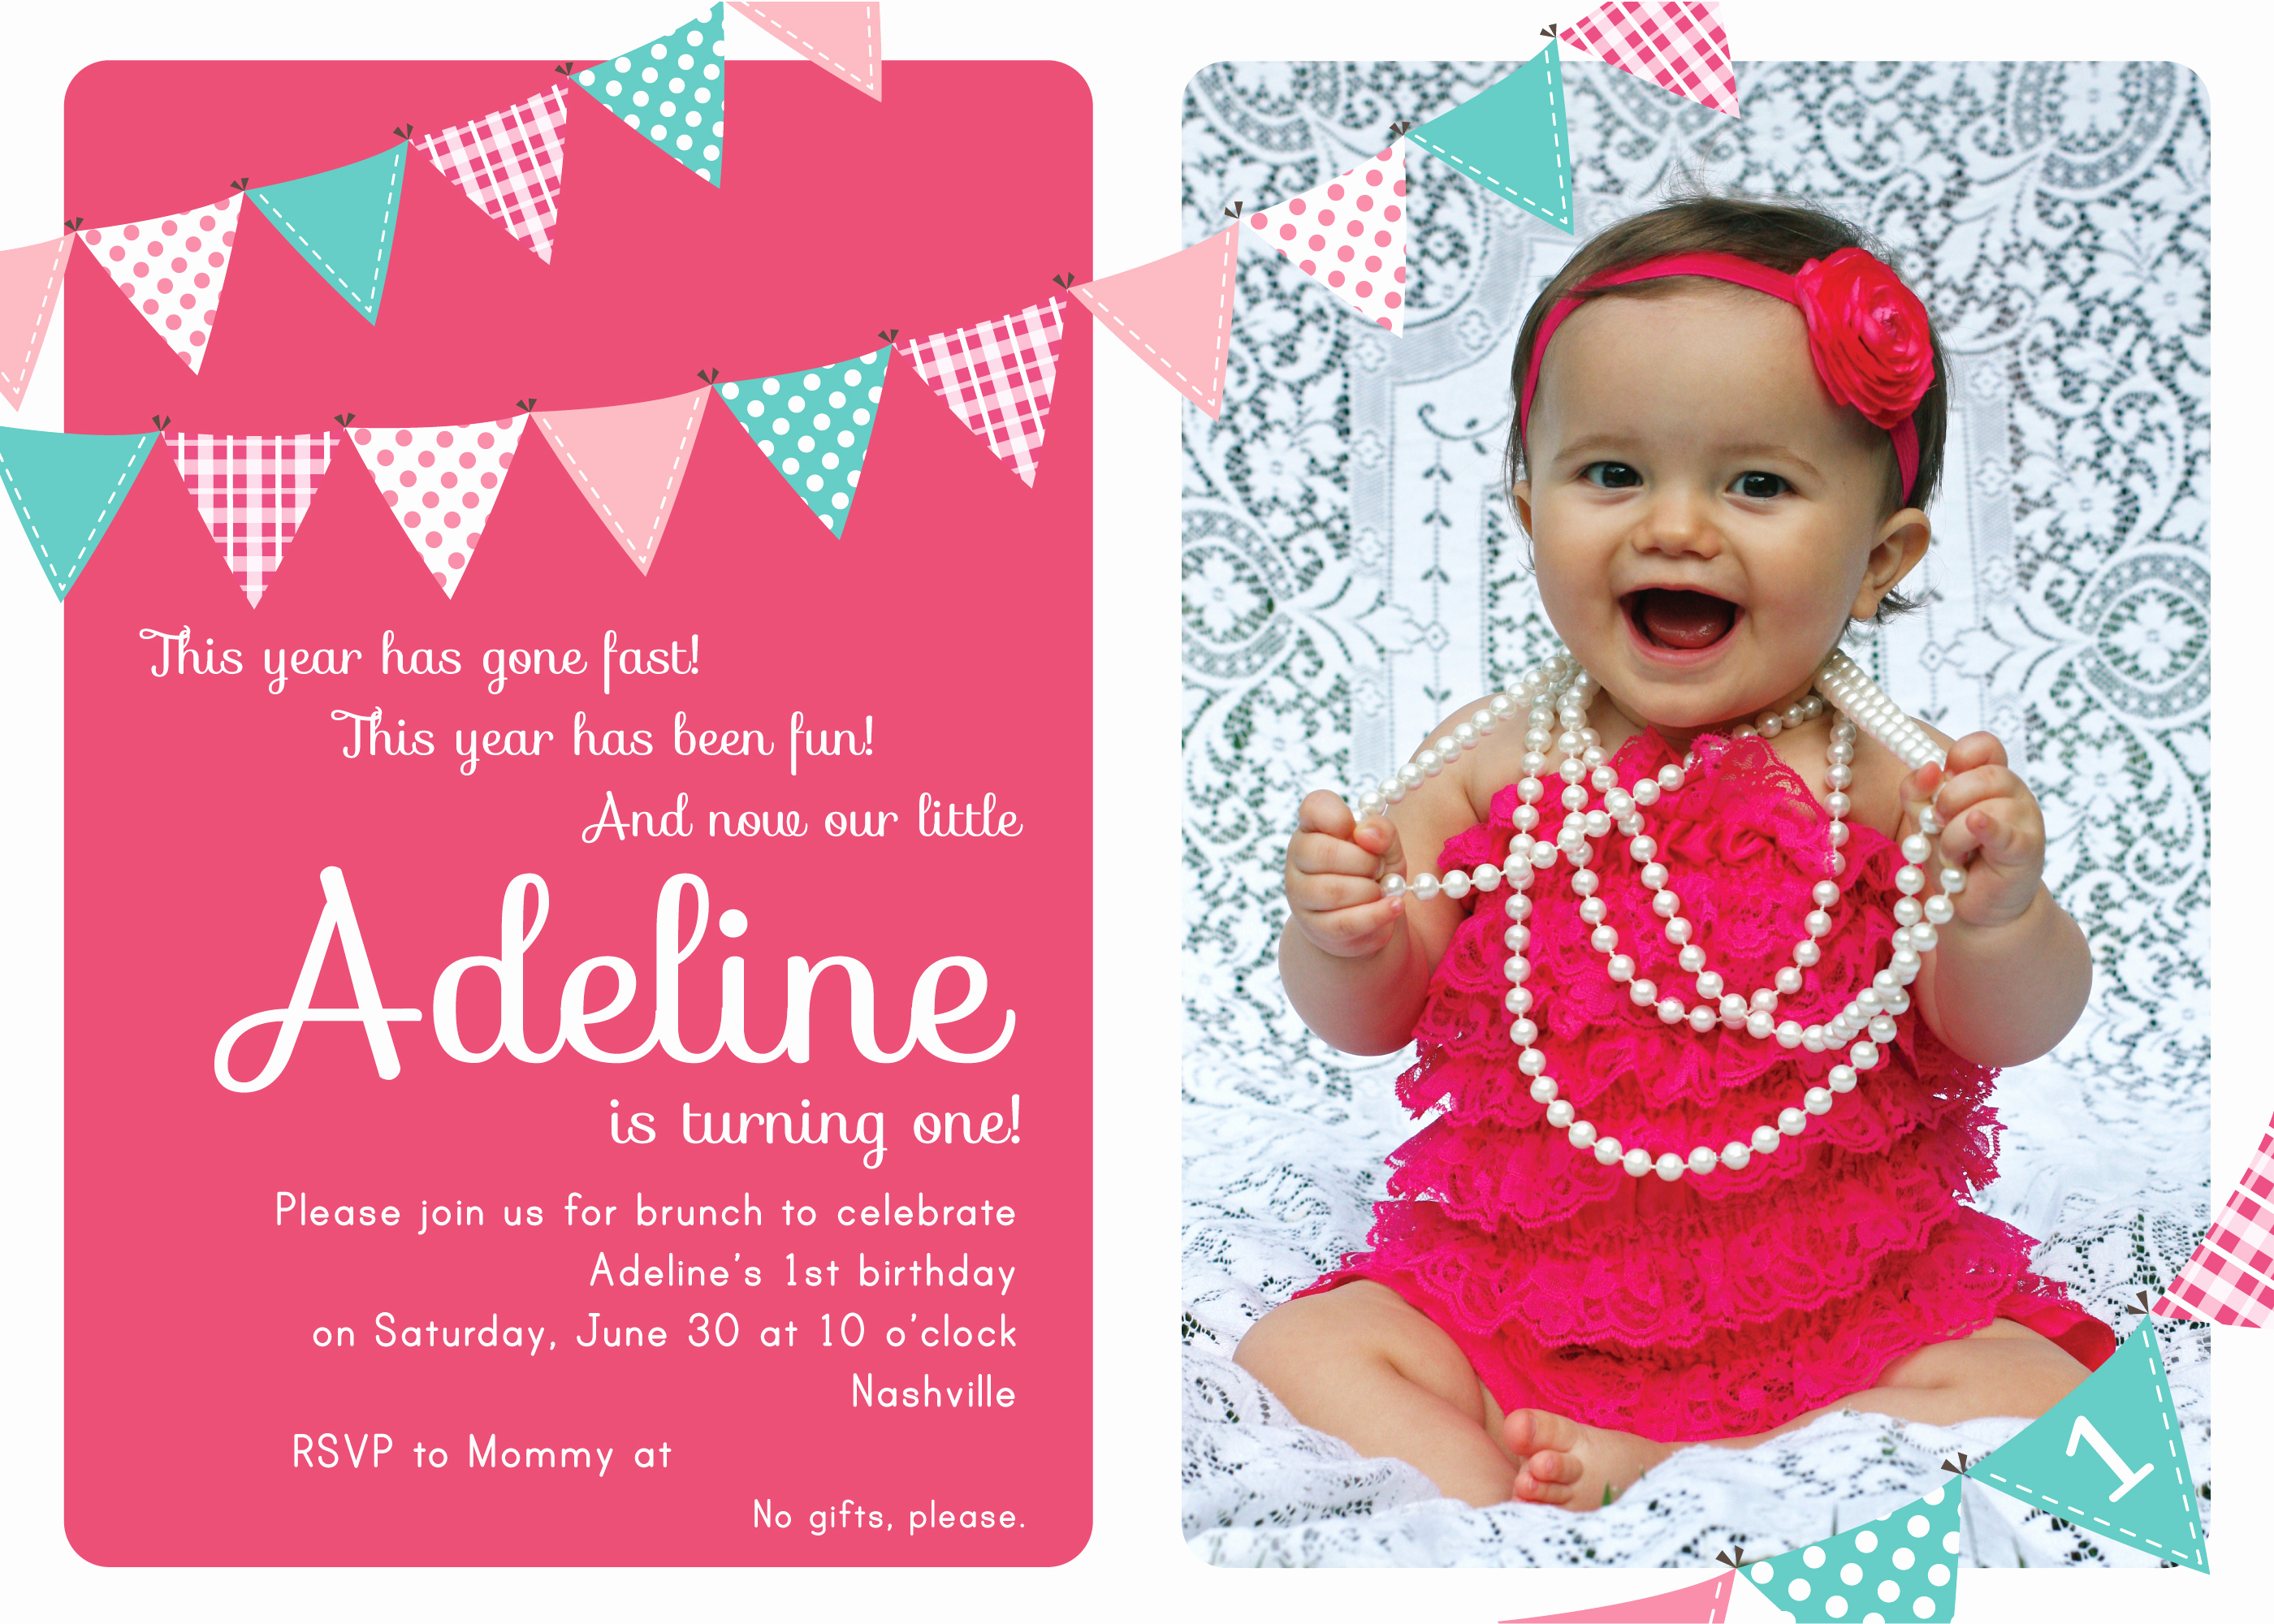 First Birthday Invitation Wording Beautiful First Birthday Party Invitation Ideas – Free Printable